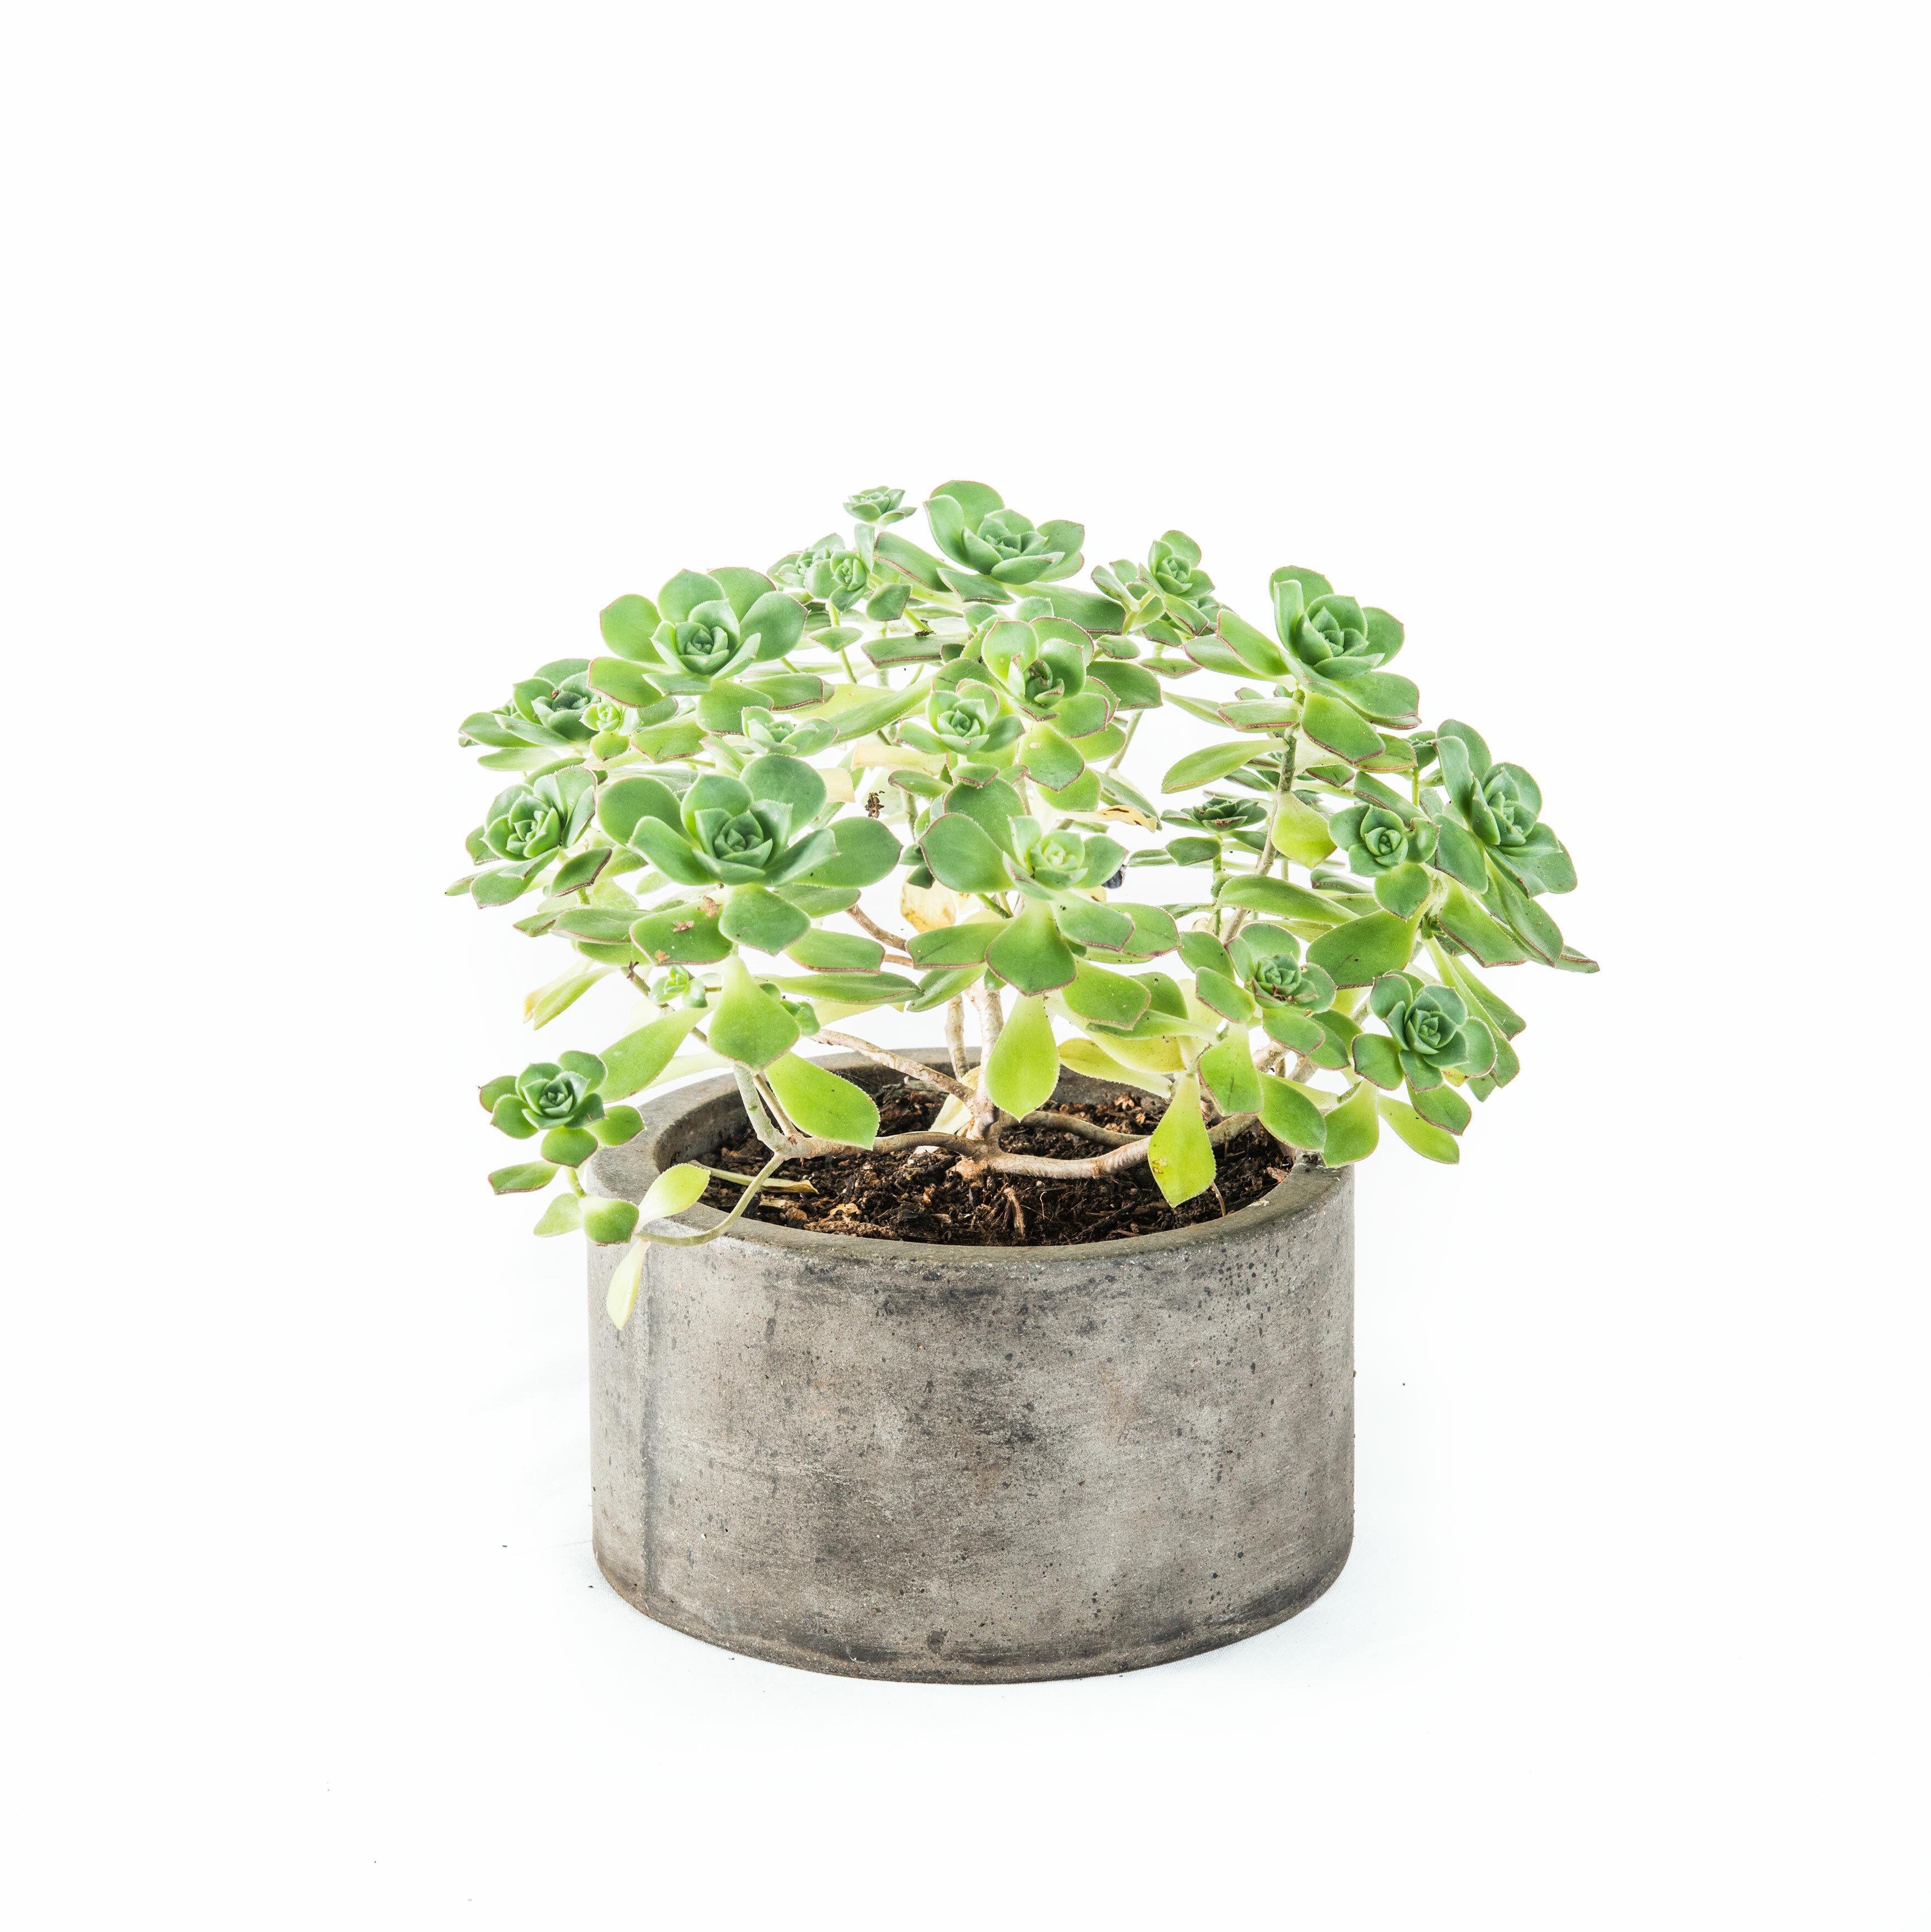 shallow sweet diy suburban weekend succulent indoor img planter image bliss